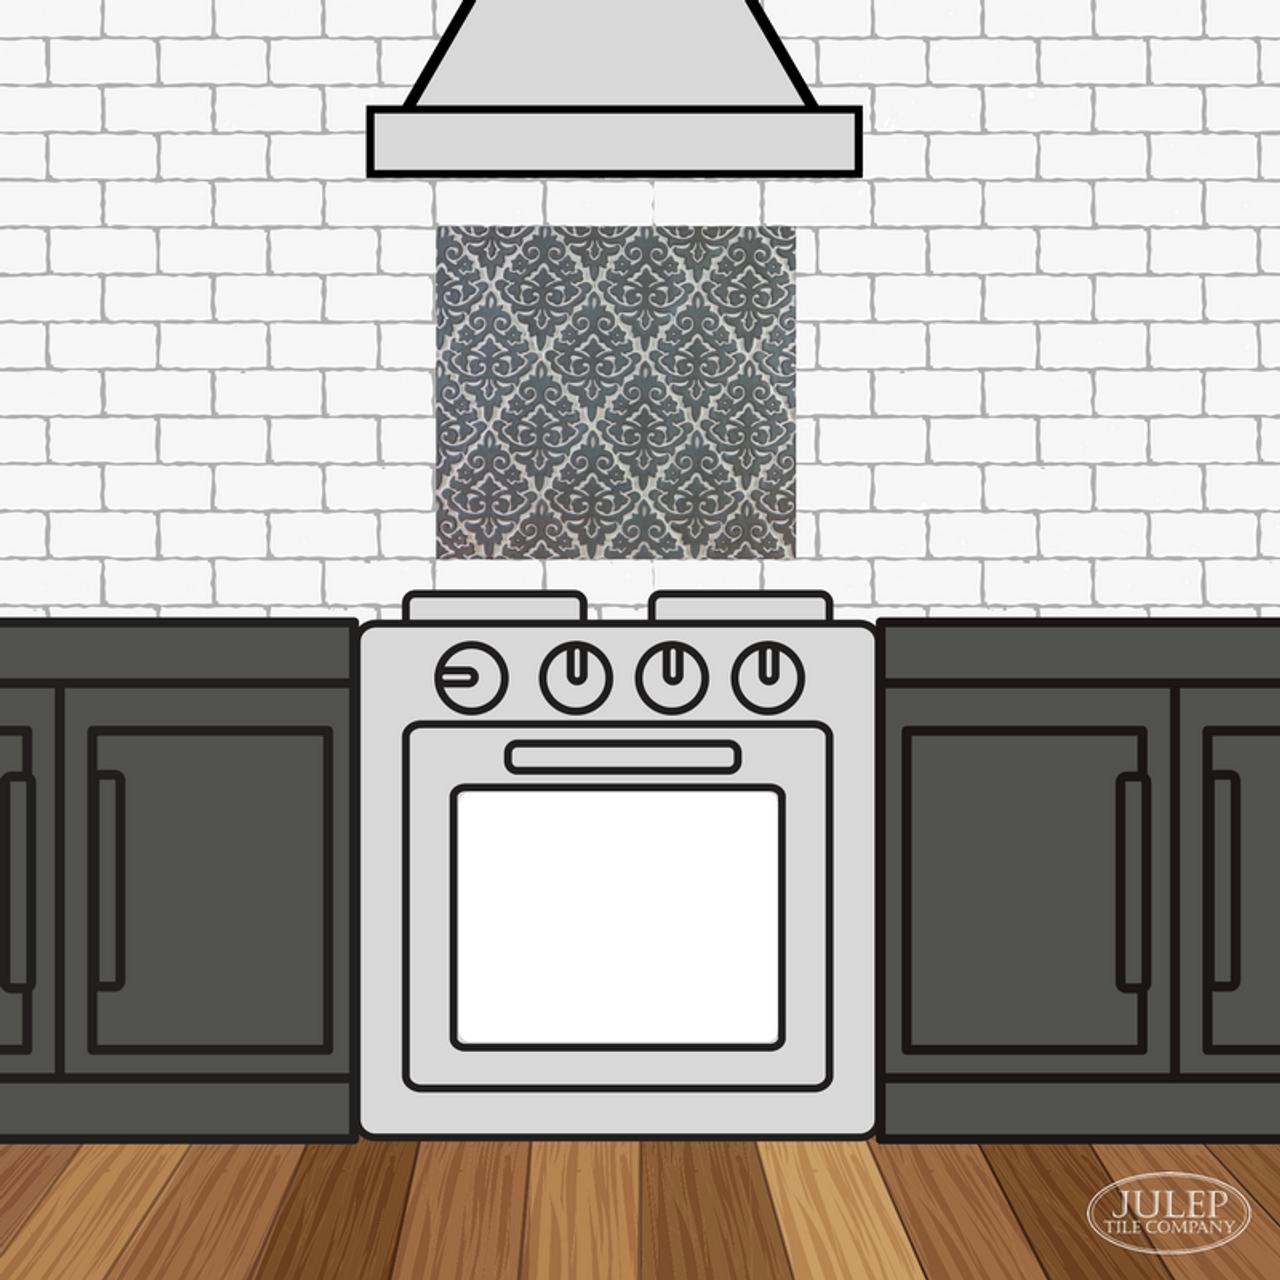 Kitchen Backsplash With Damask Handmade Tile Decorative Insert Over The Stove